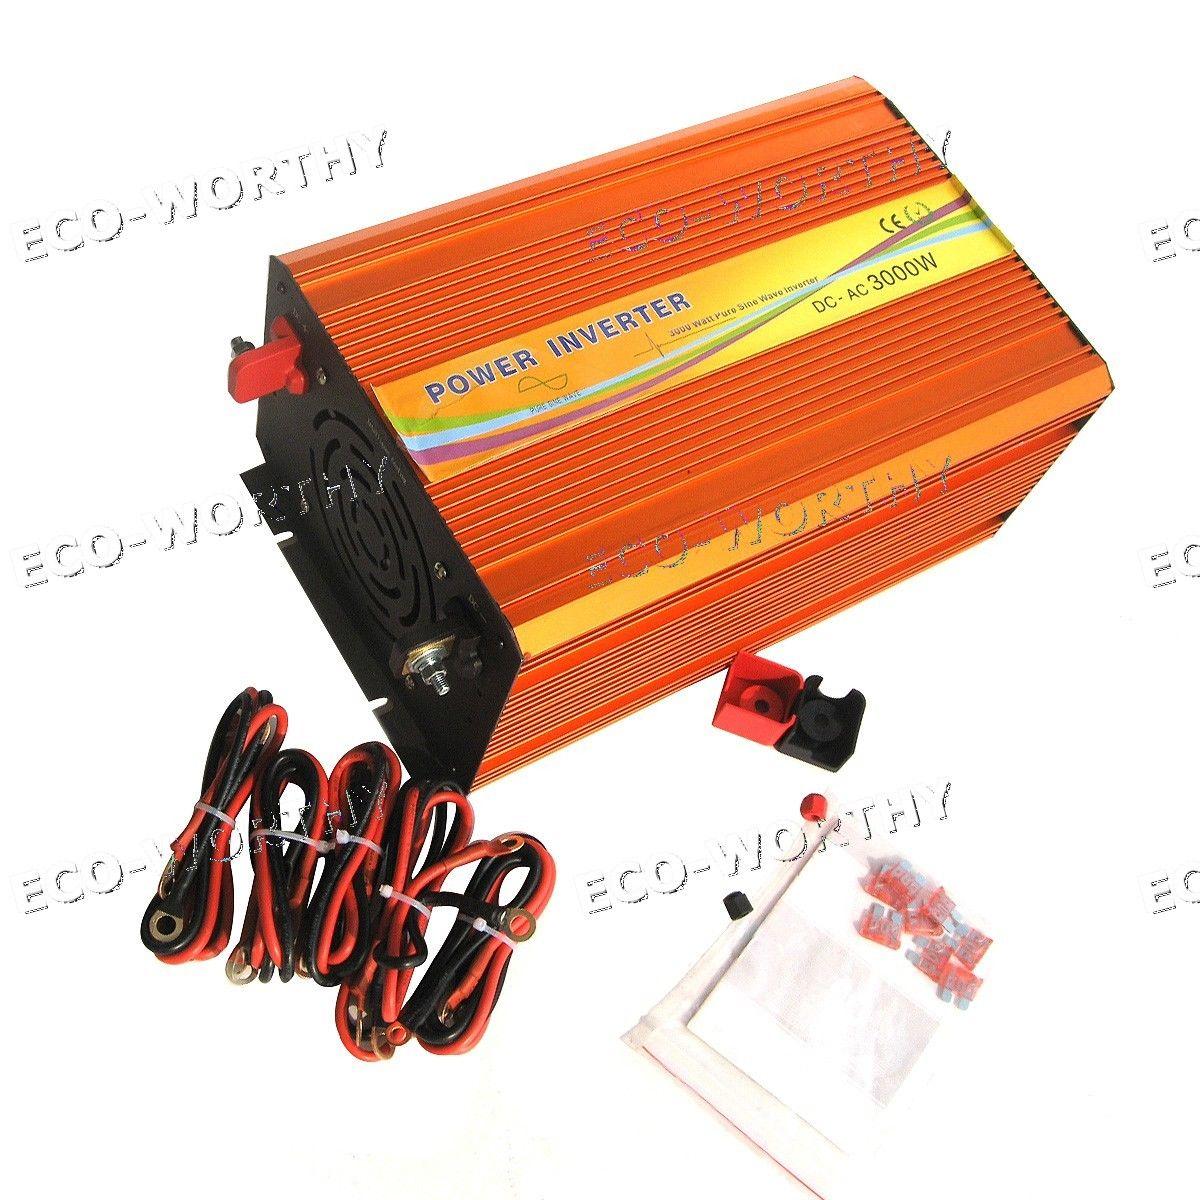 1.5KW 3KW 12V to 220V off Grid Inverter Charger Converter electricity supply панель декоративная awenta pet100 д вентилятора kw сатин